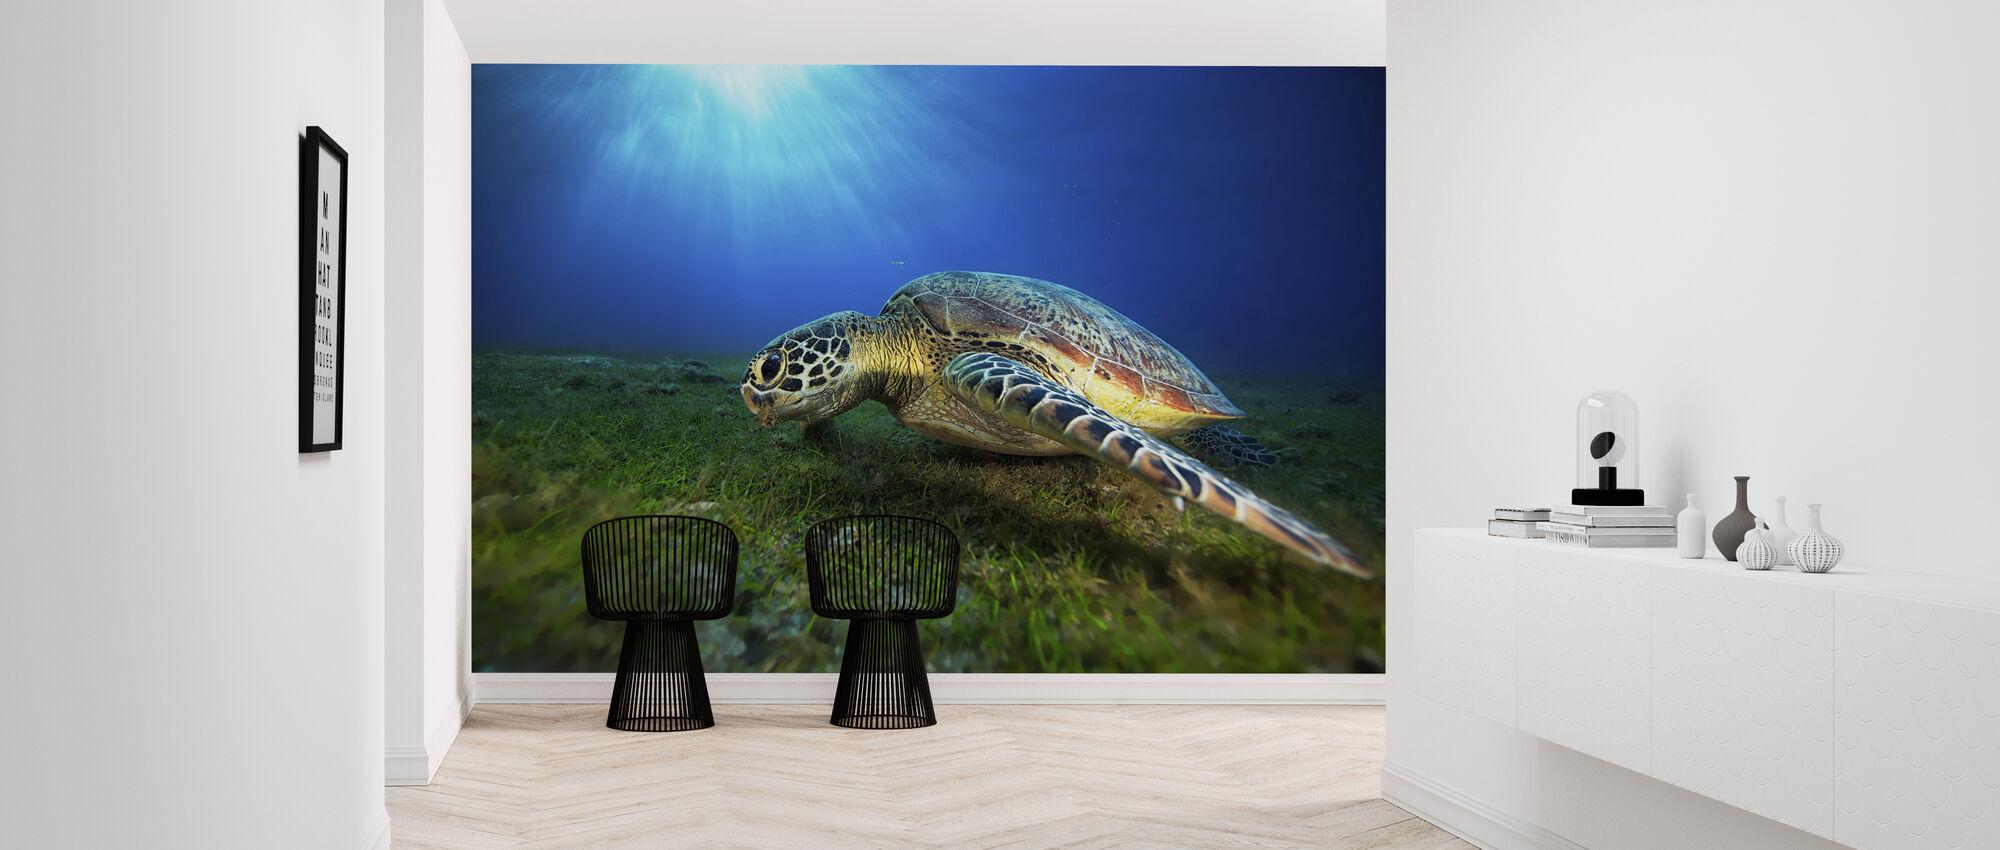 Green Turtle - Wallpaper - Hallway